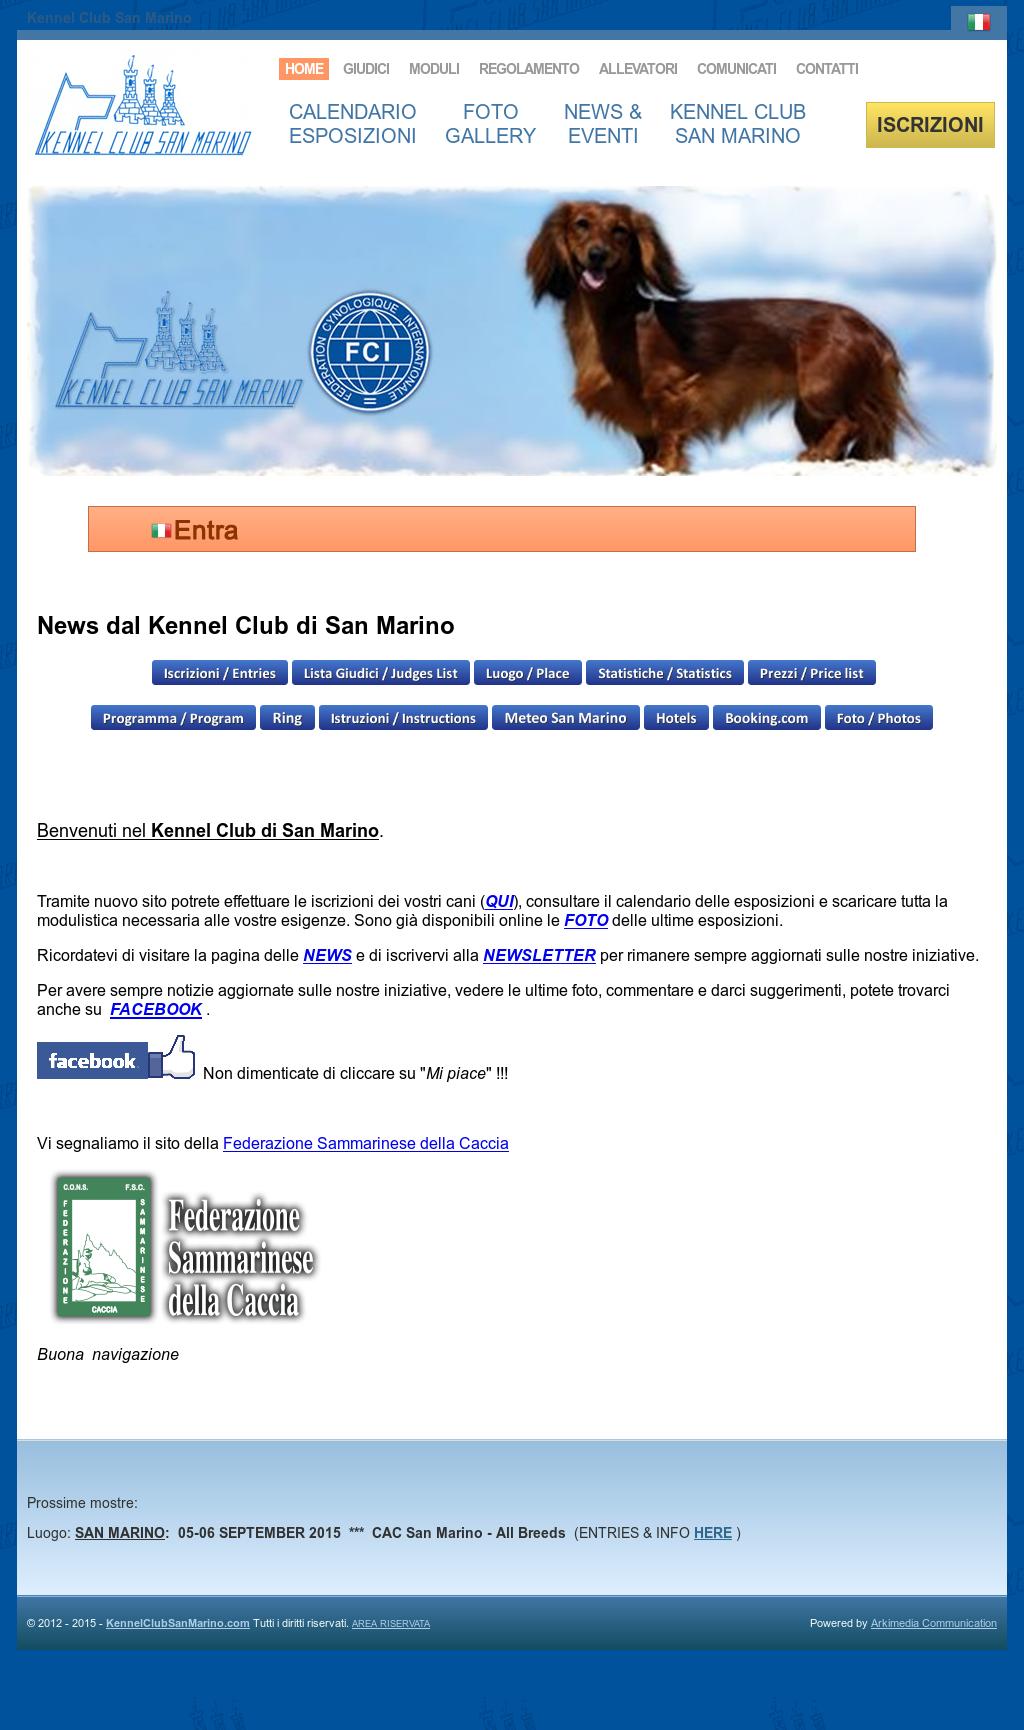 Expocani Calendario.Kennel Club San Marino Competitors Revenue And Employees